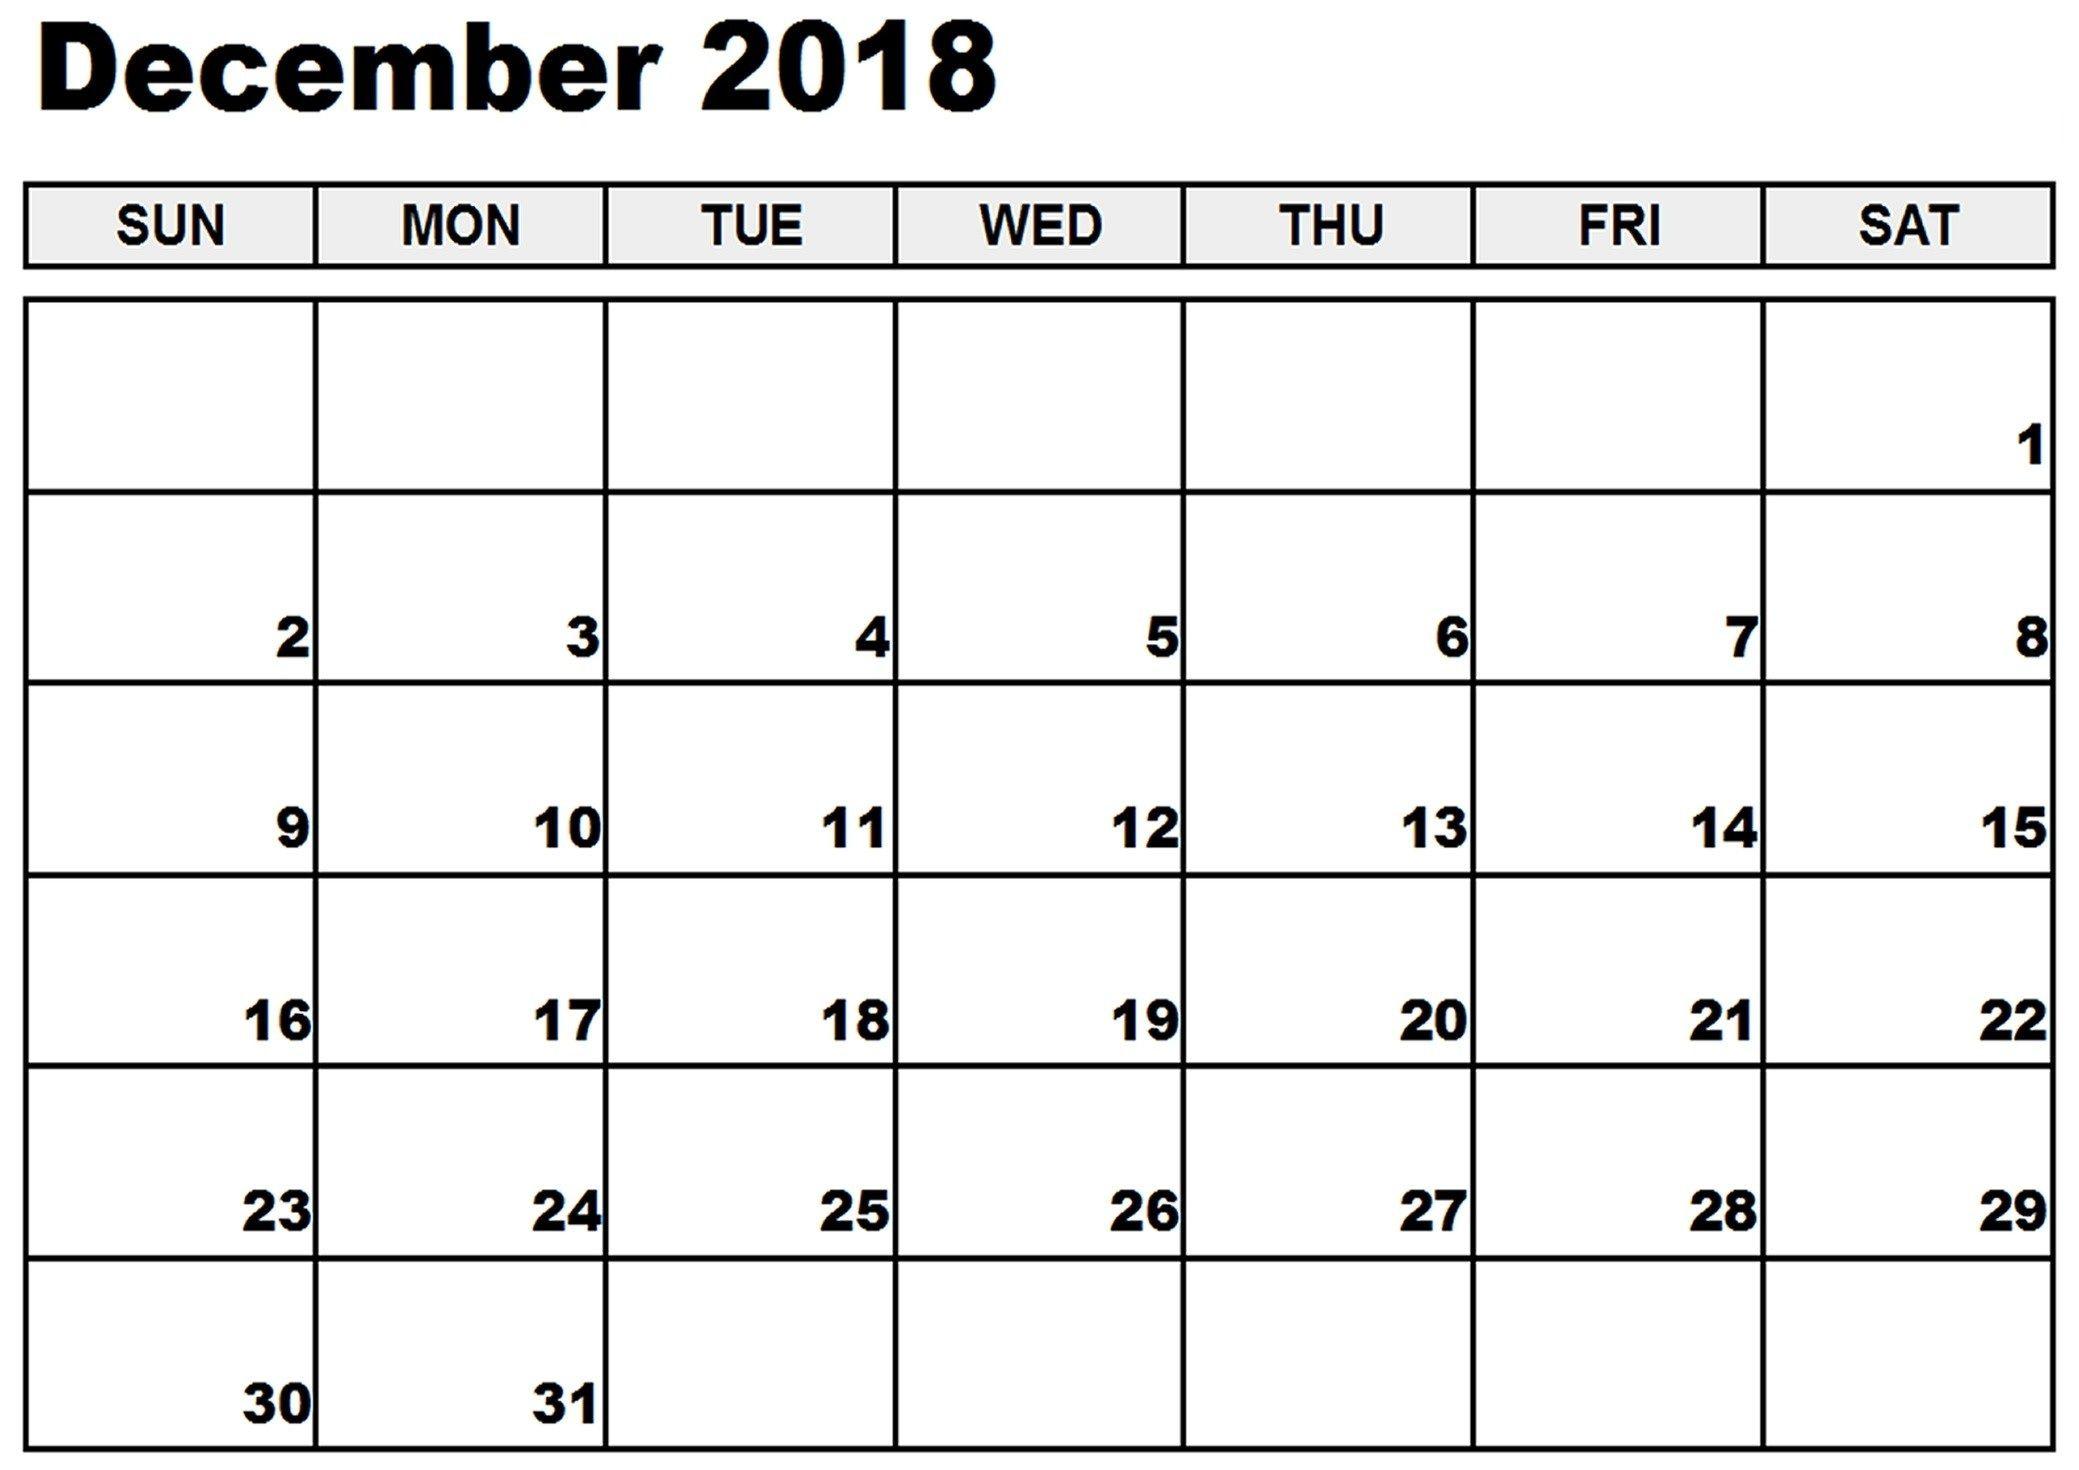 December 2018 Printable Calendar Notes To Do List Reminders